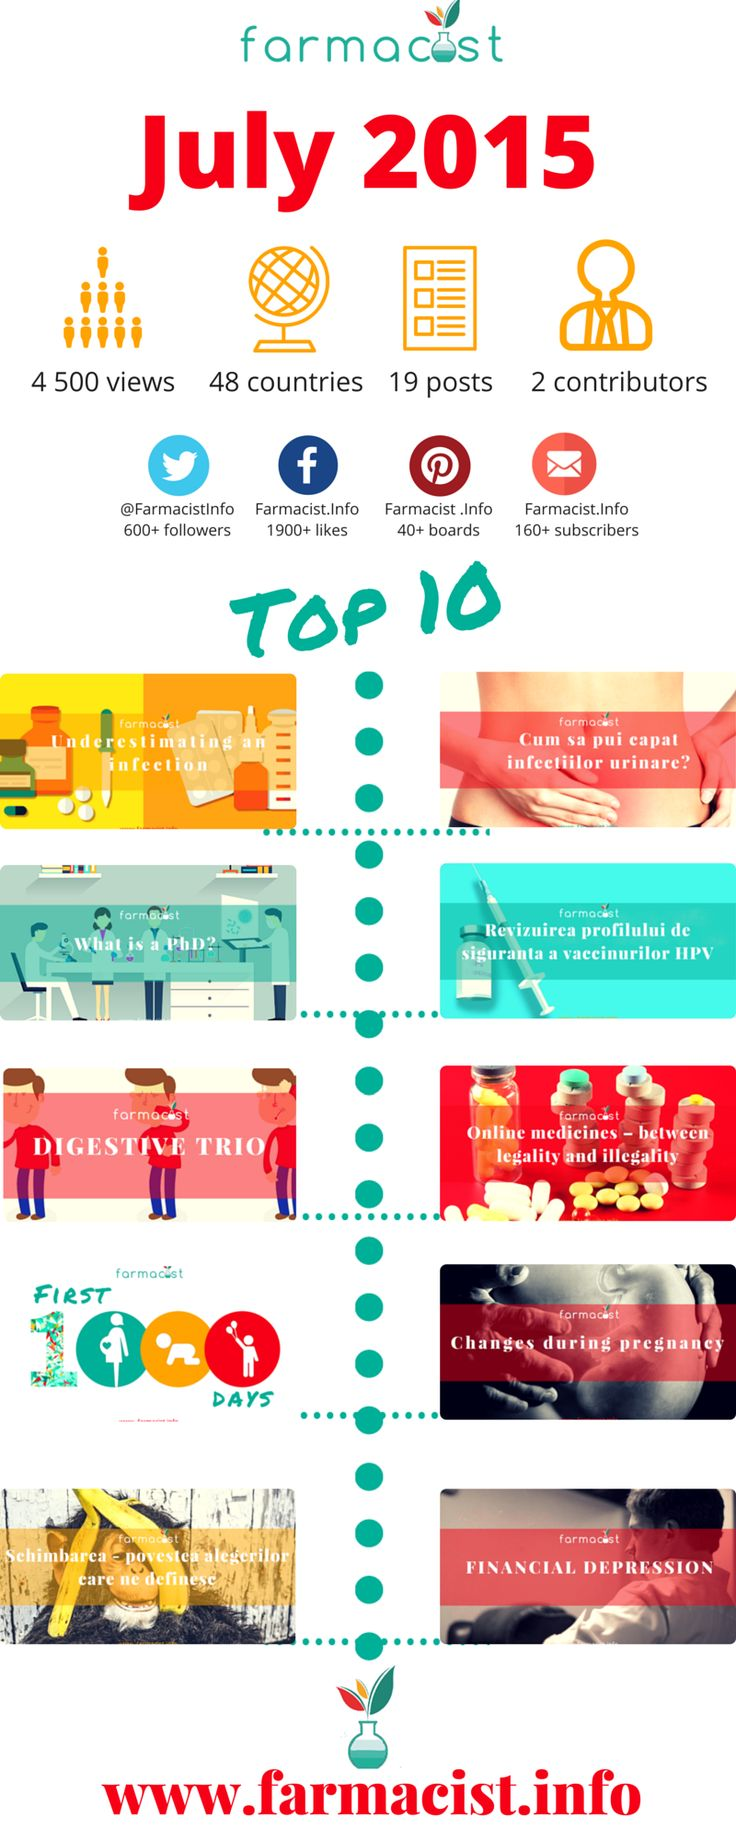 Guide Des Medicaments Doctissimo